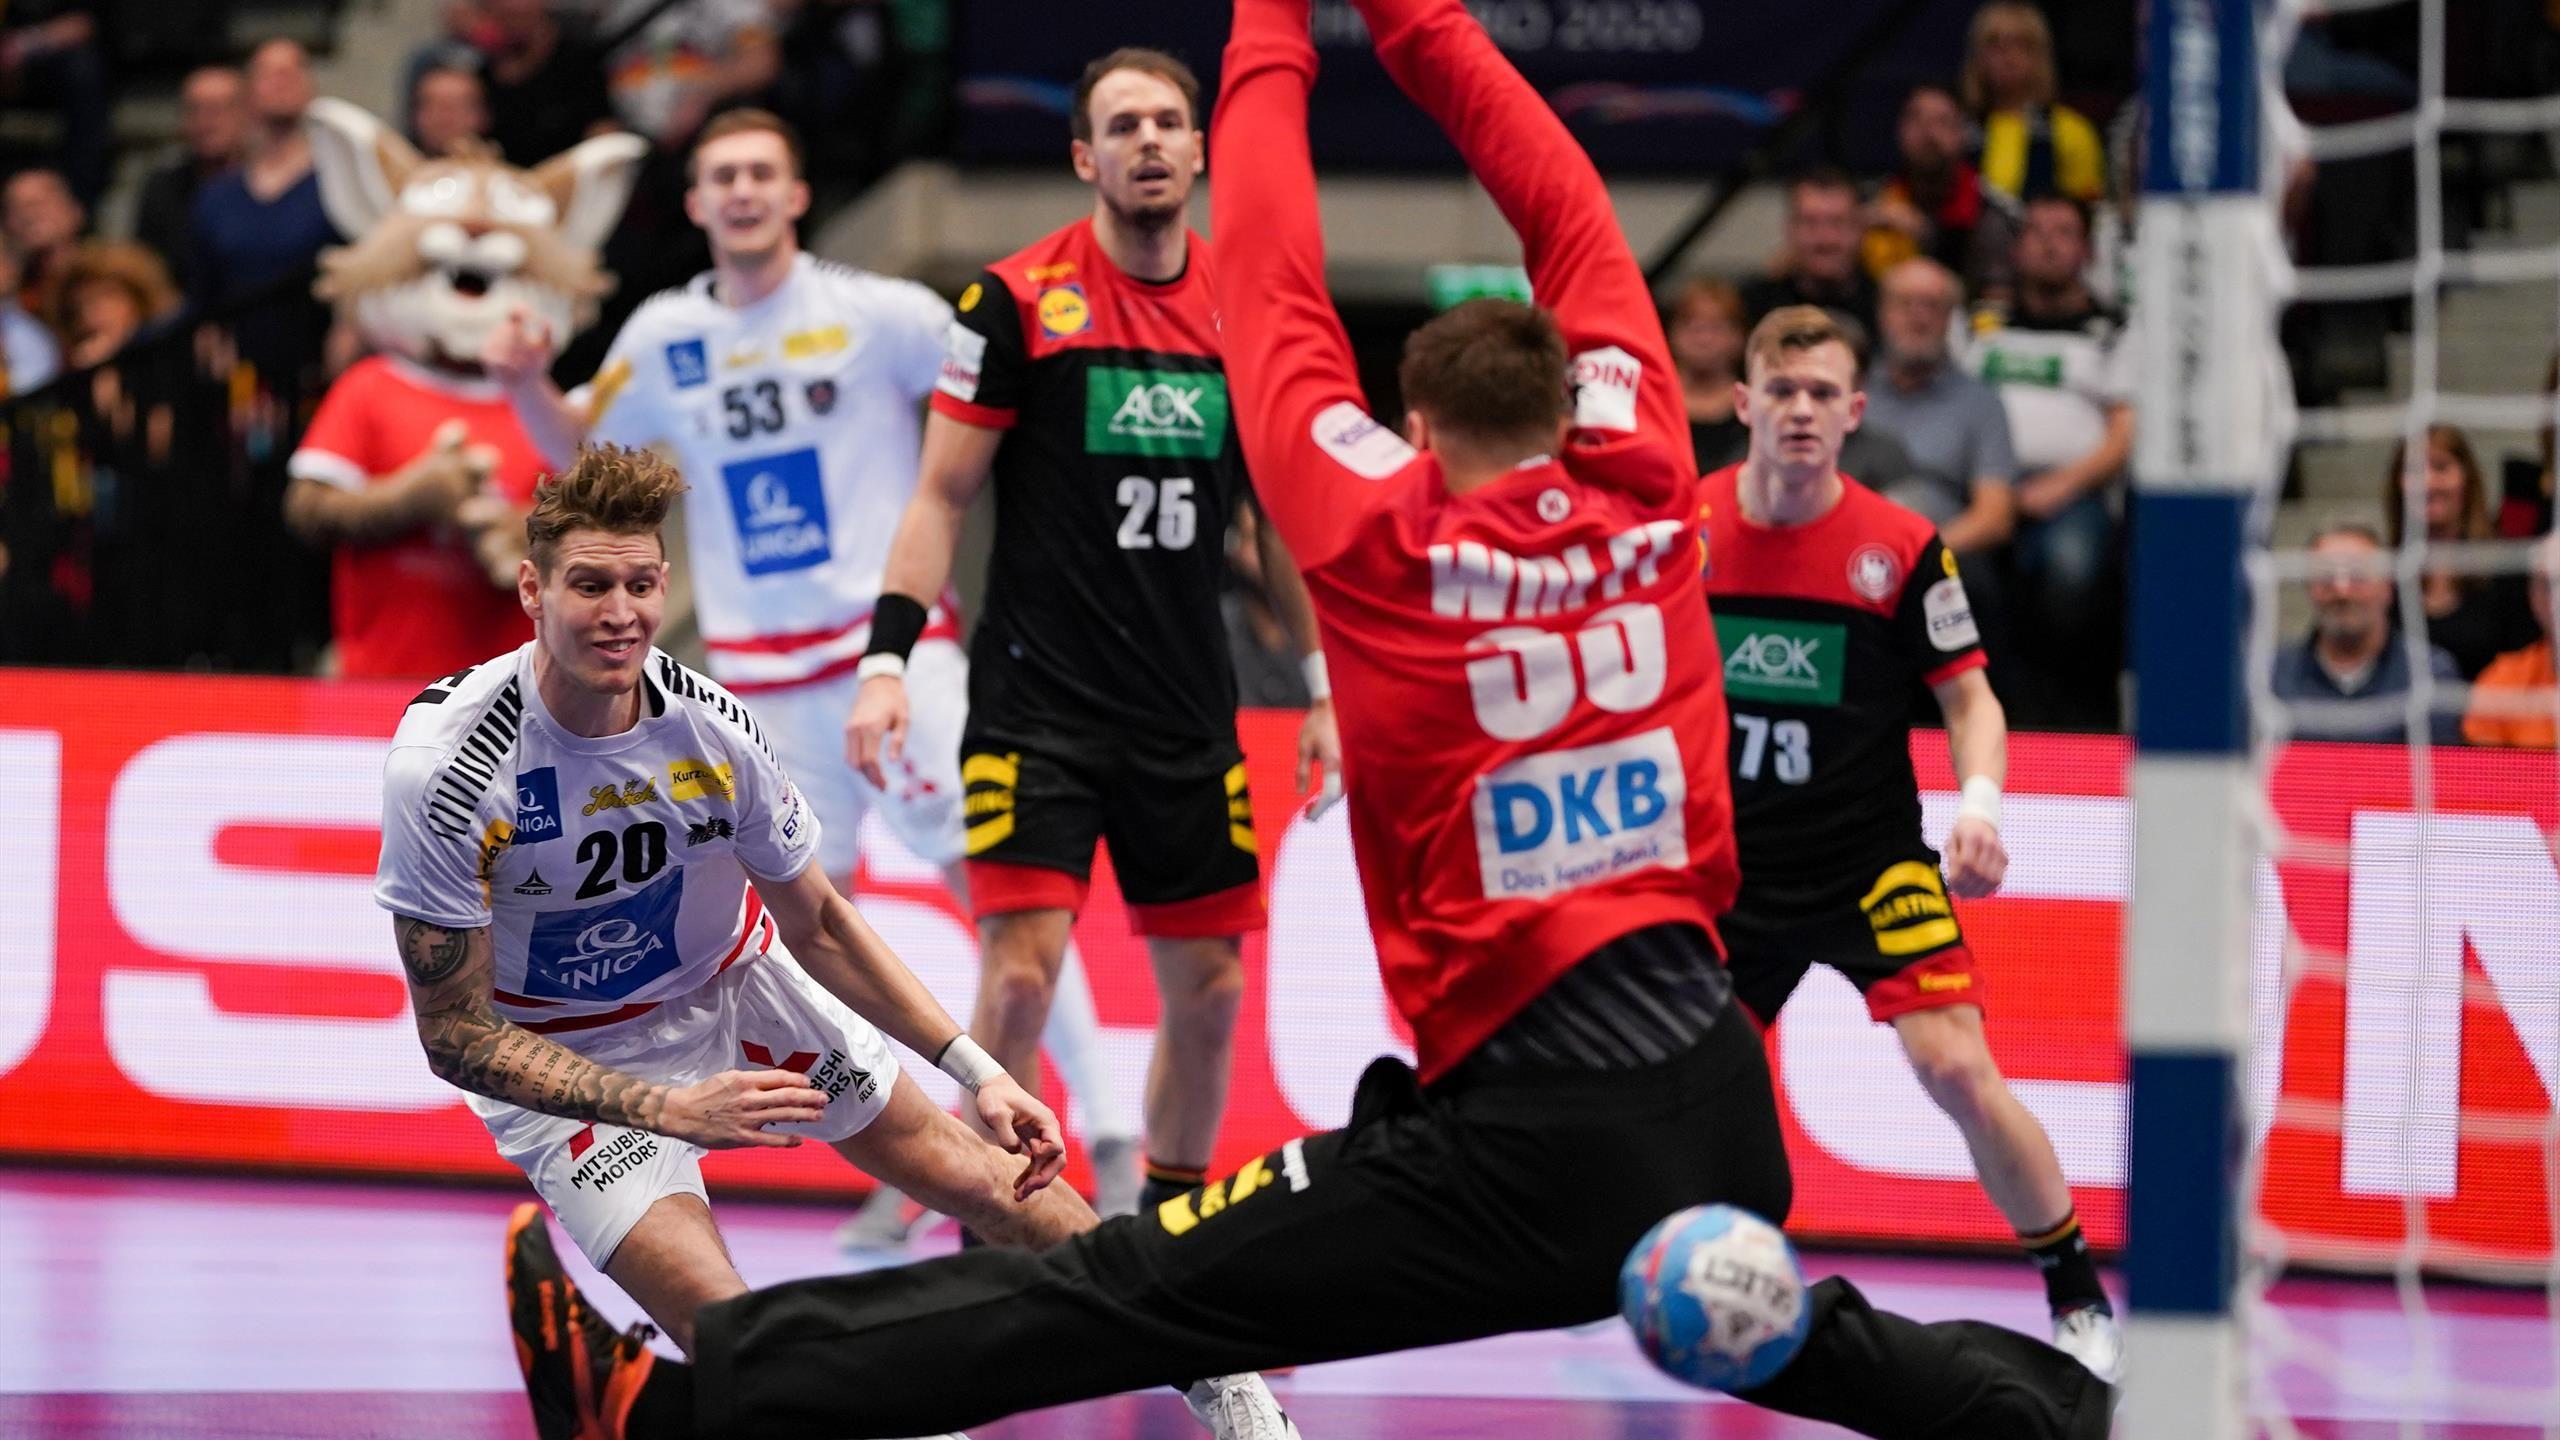 handball olympia quali erst im juni